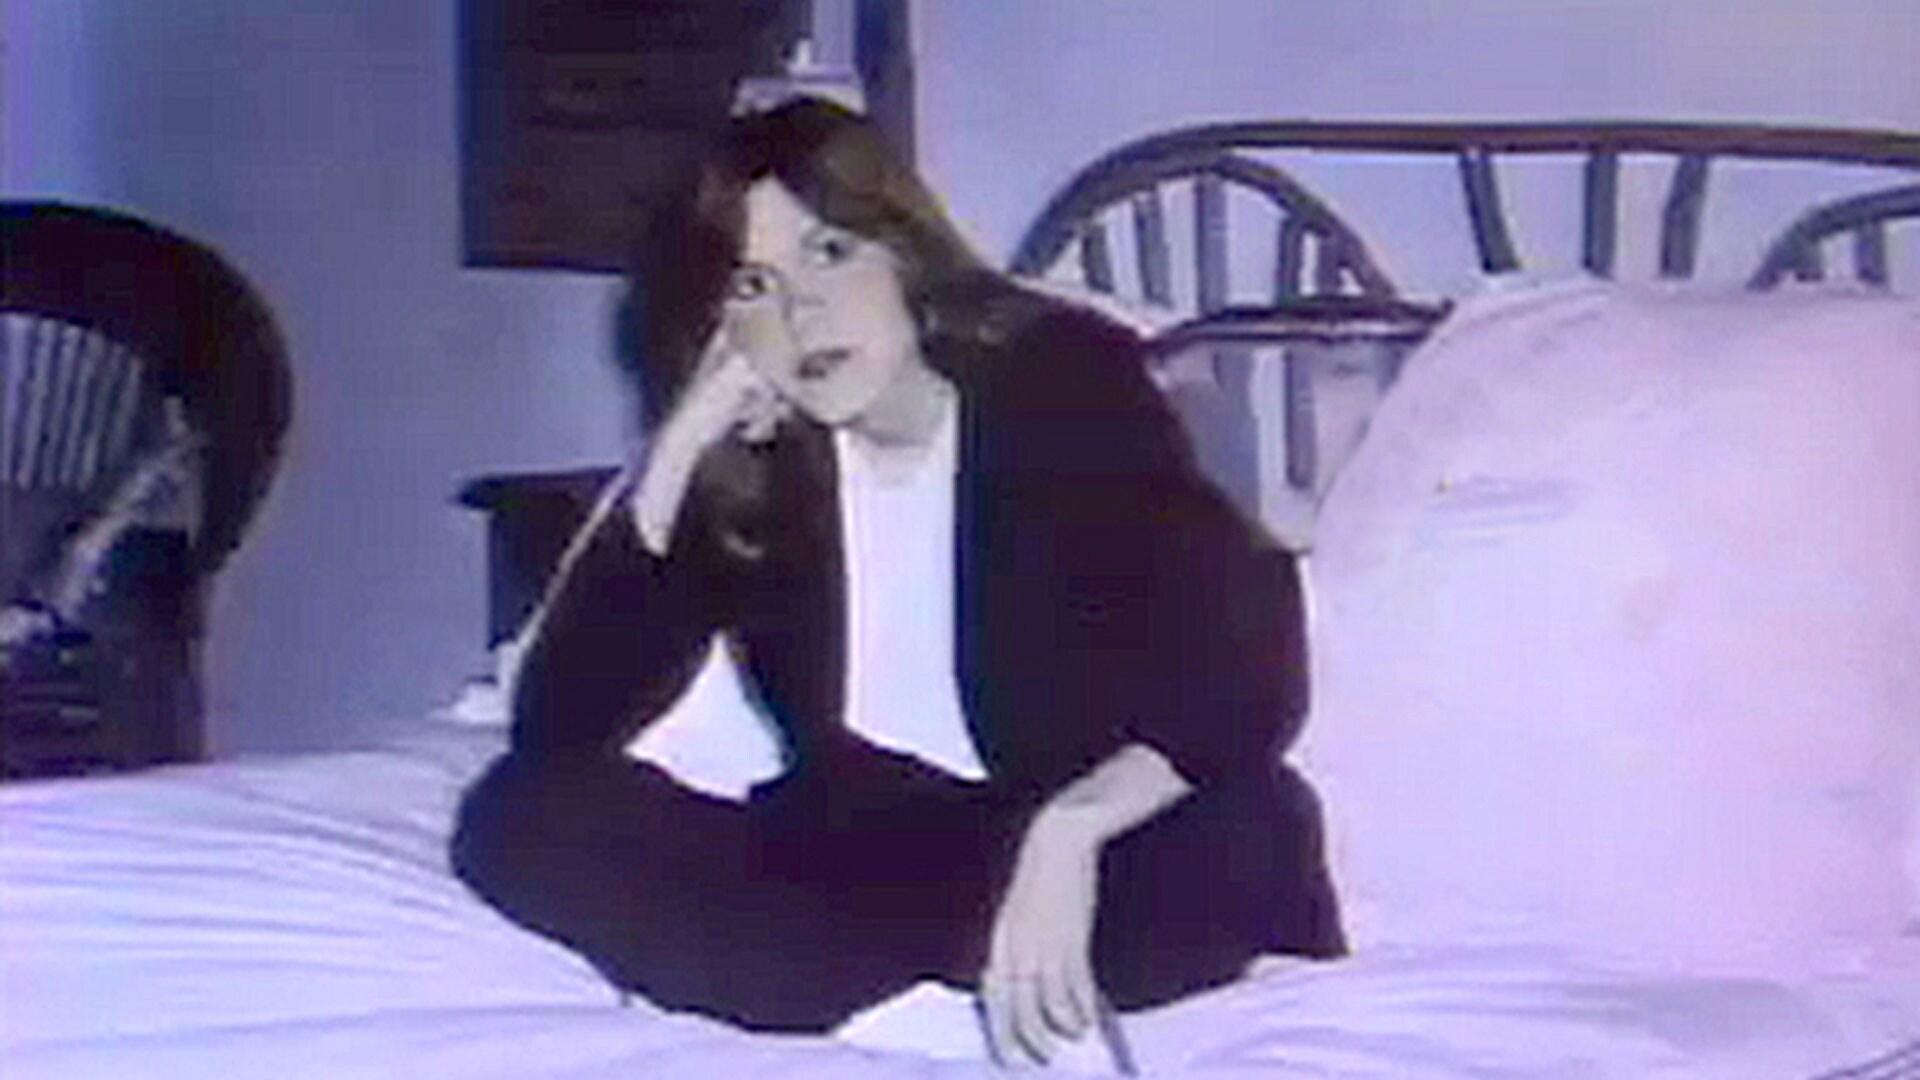 Carrie Fisher: November 18, 1978